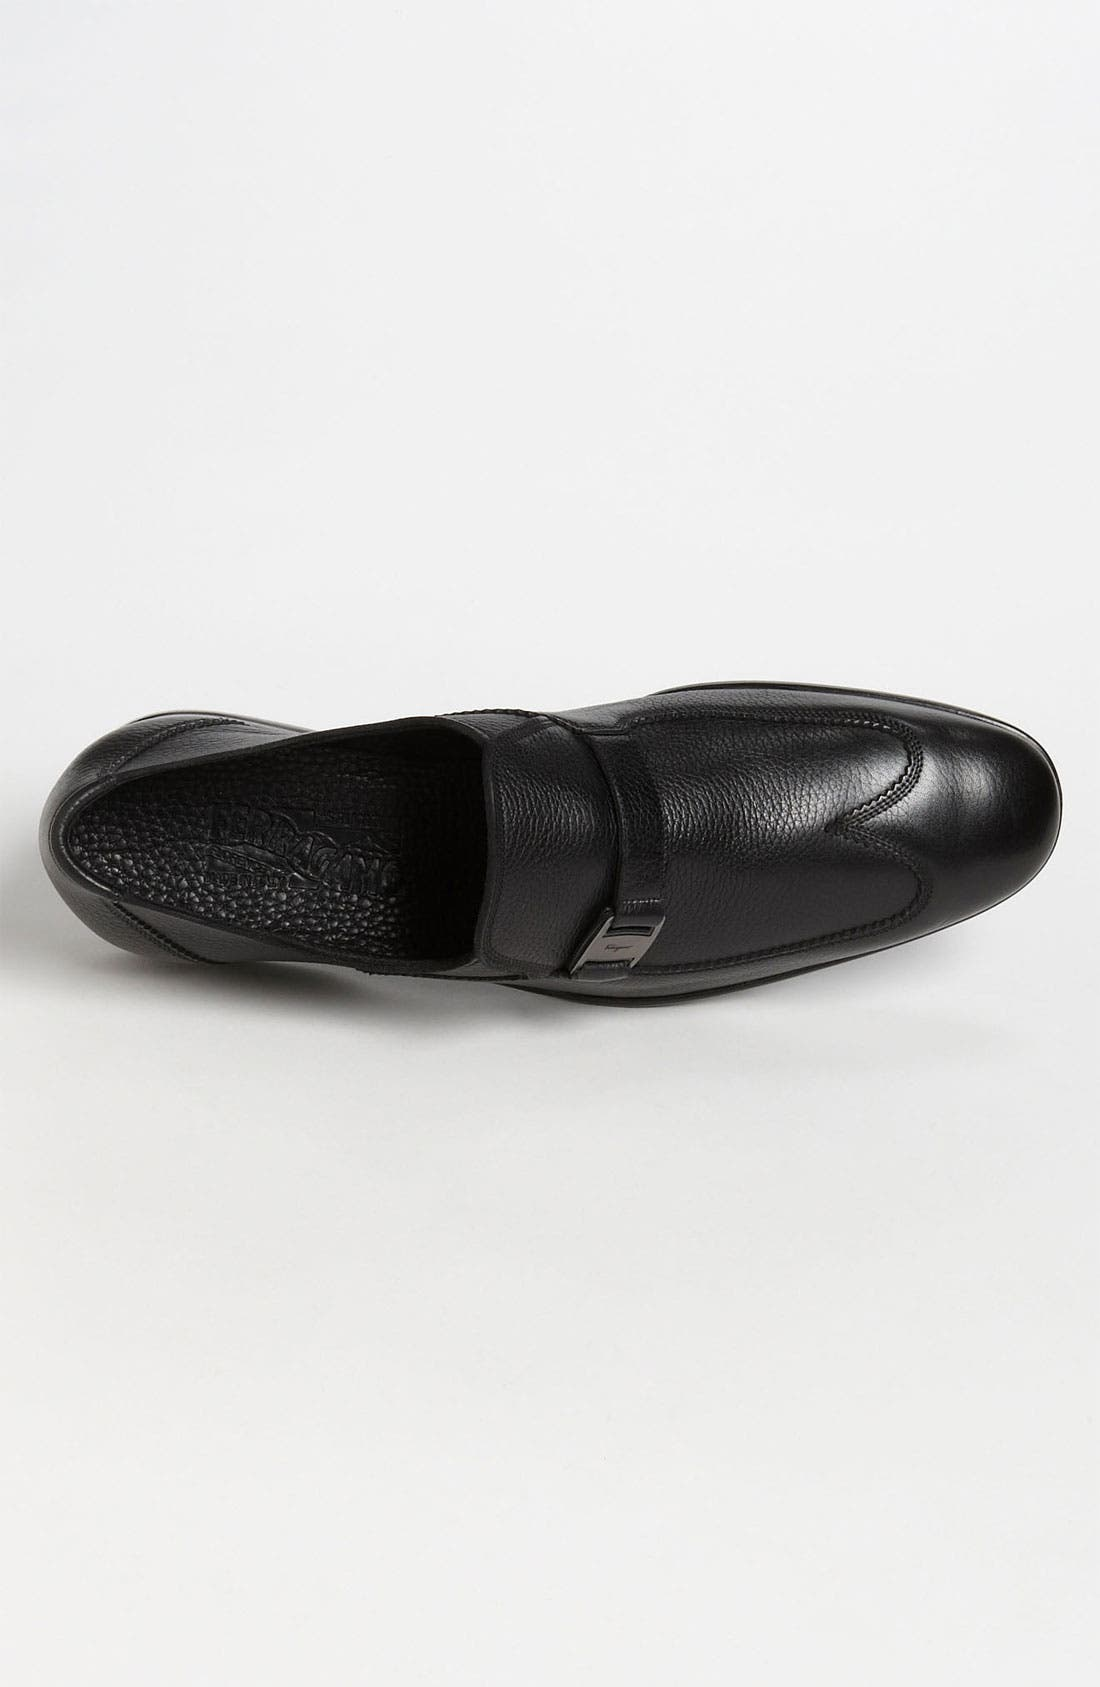 Alternate Image 3  - Salvatore Ferragamo 'Tecno' Wingtip Loafer